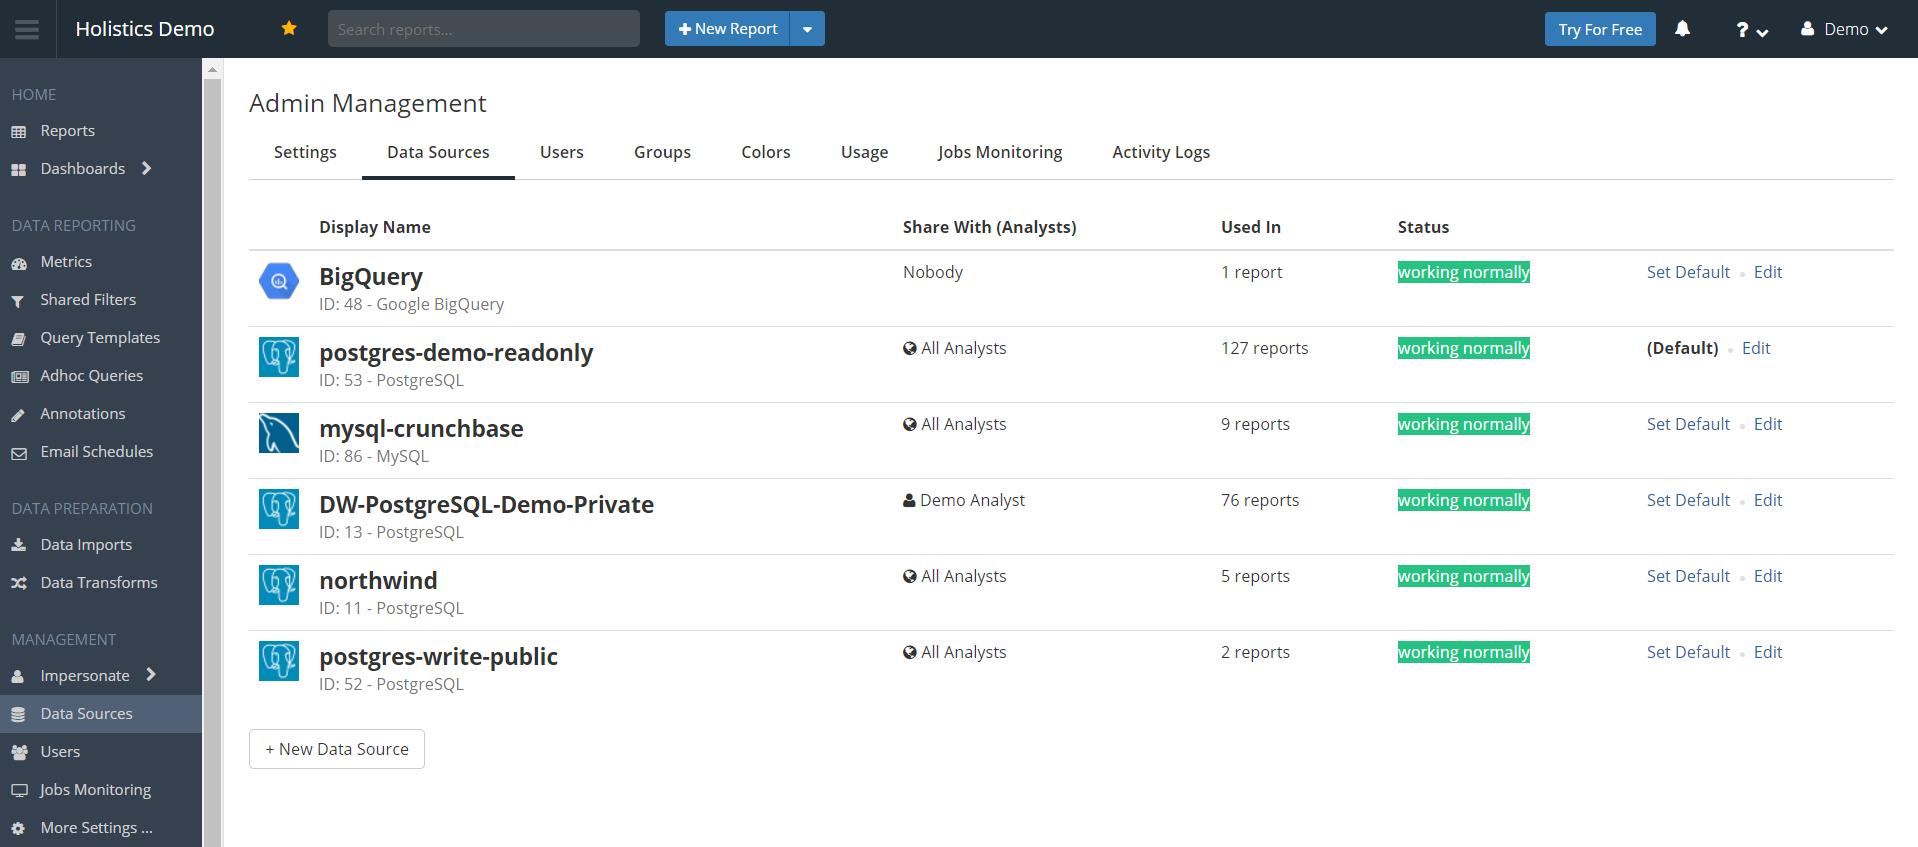 Data sources menu